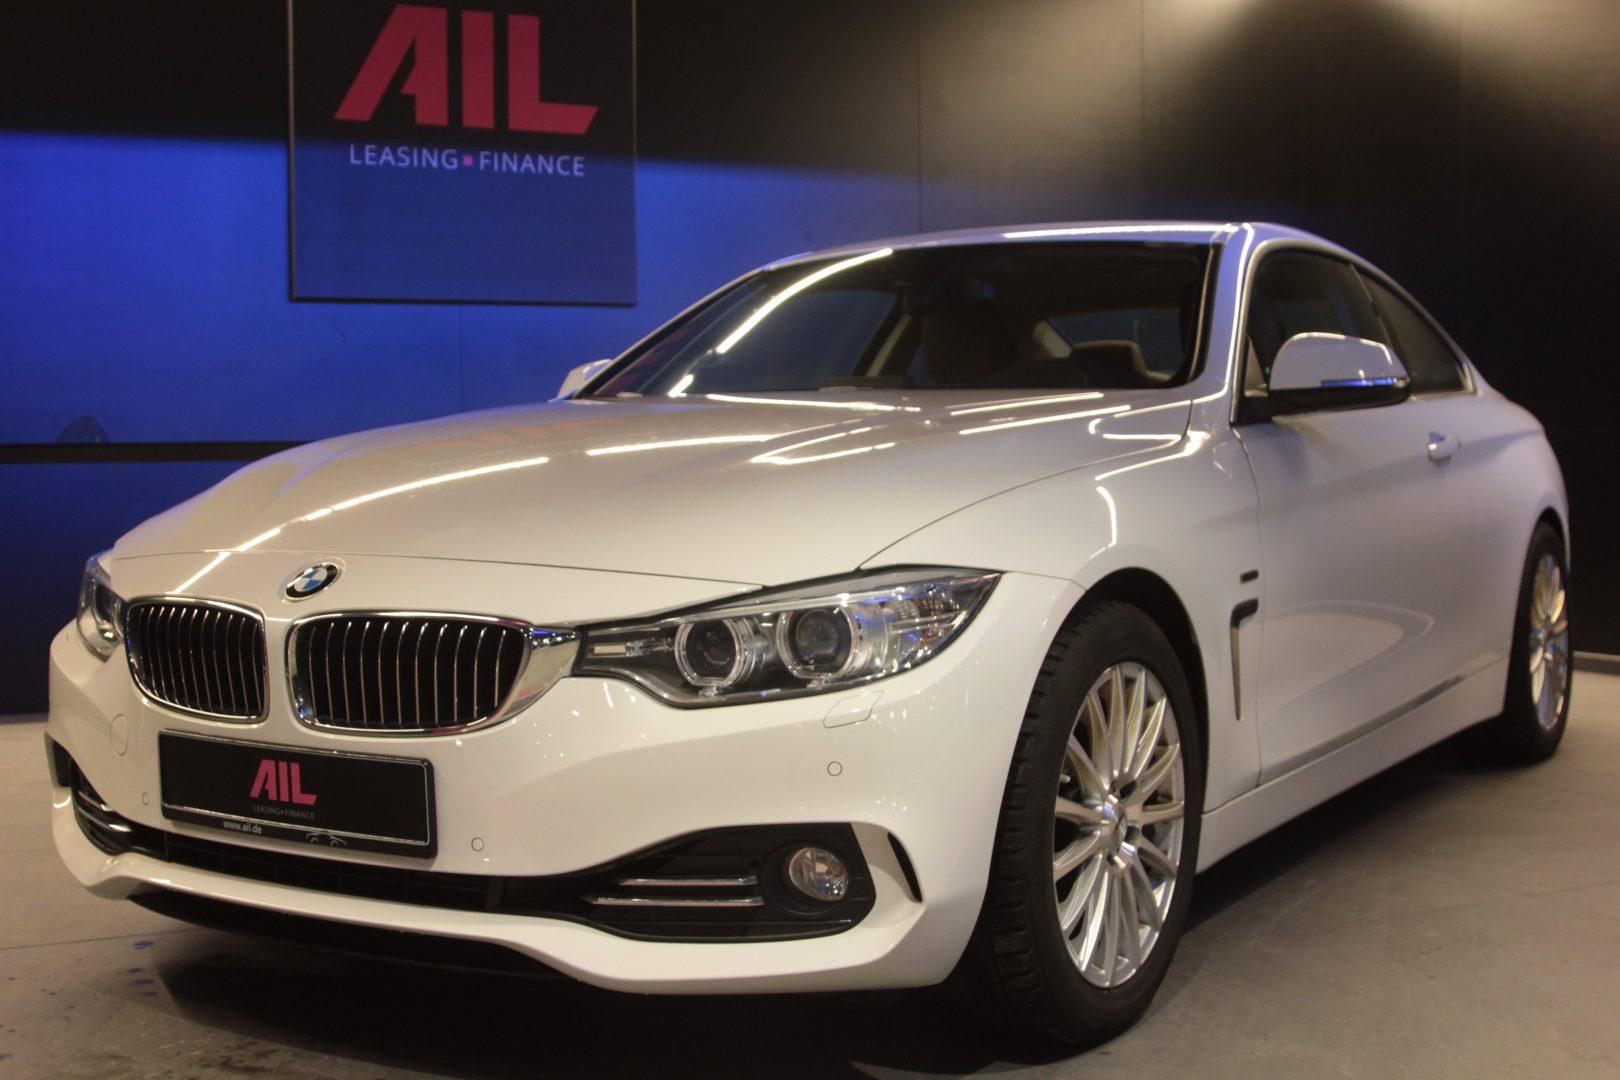 AIL BMW 430d 8